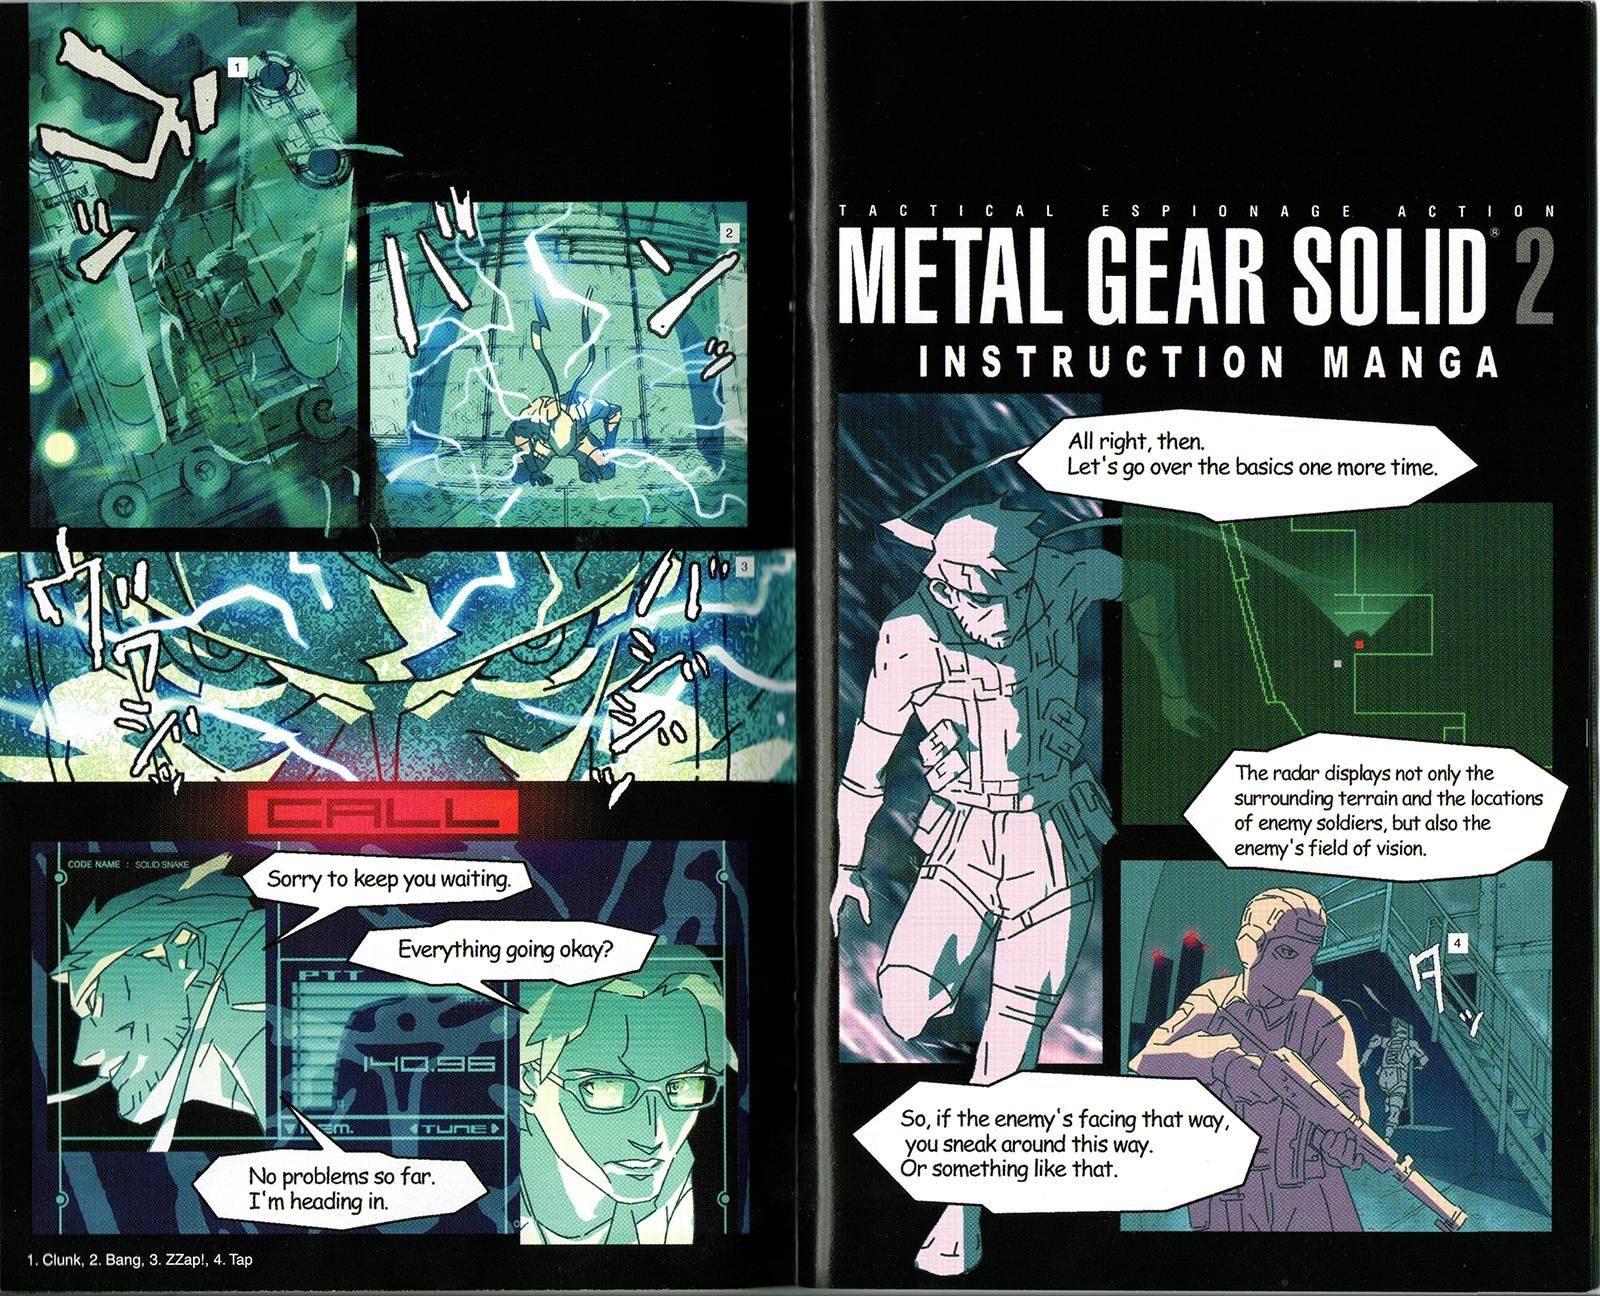 Metal Gear Solid 2 Instruction Manga